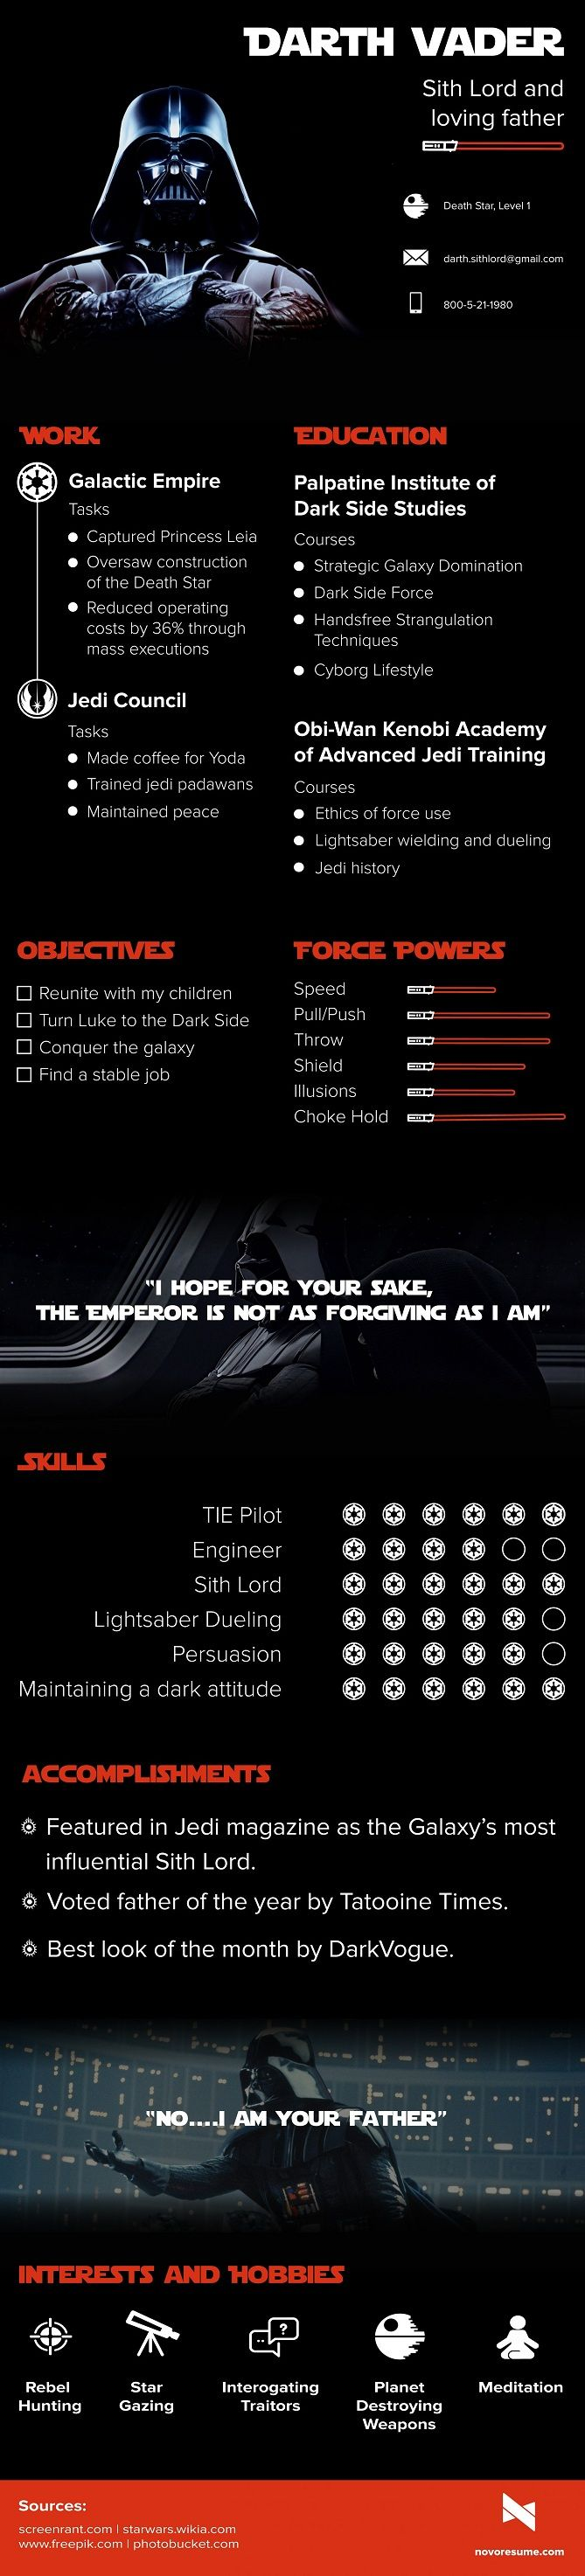 "Novoresume.com tarafından hazırlanan ""Darth Vader Sith Lord and loving father"" infografiği #film #sinema #özgeçmiş #resume #dizi #infografik #infographic #work #business #socialbusiness #kariyer #movie #starwars #darthvader #sithlord #father #jedi #force"